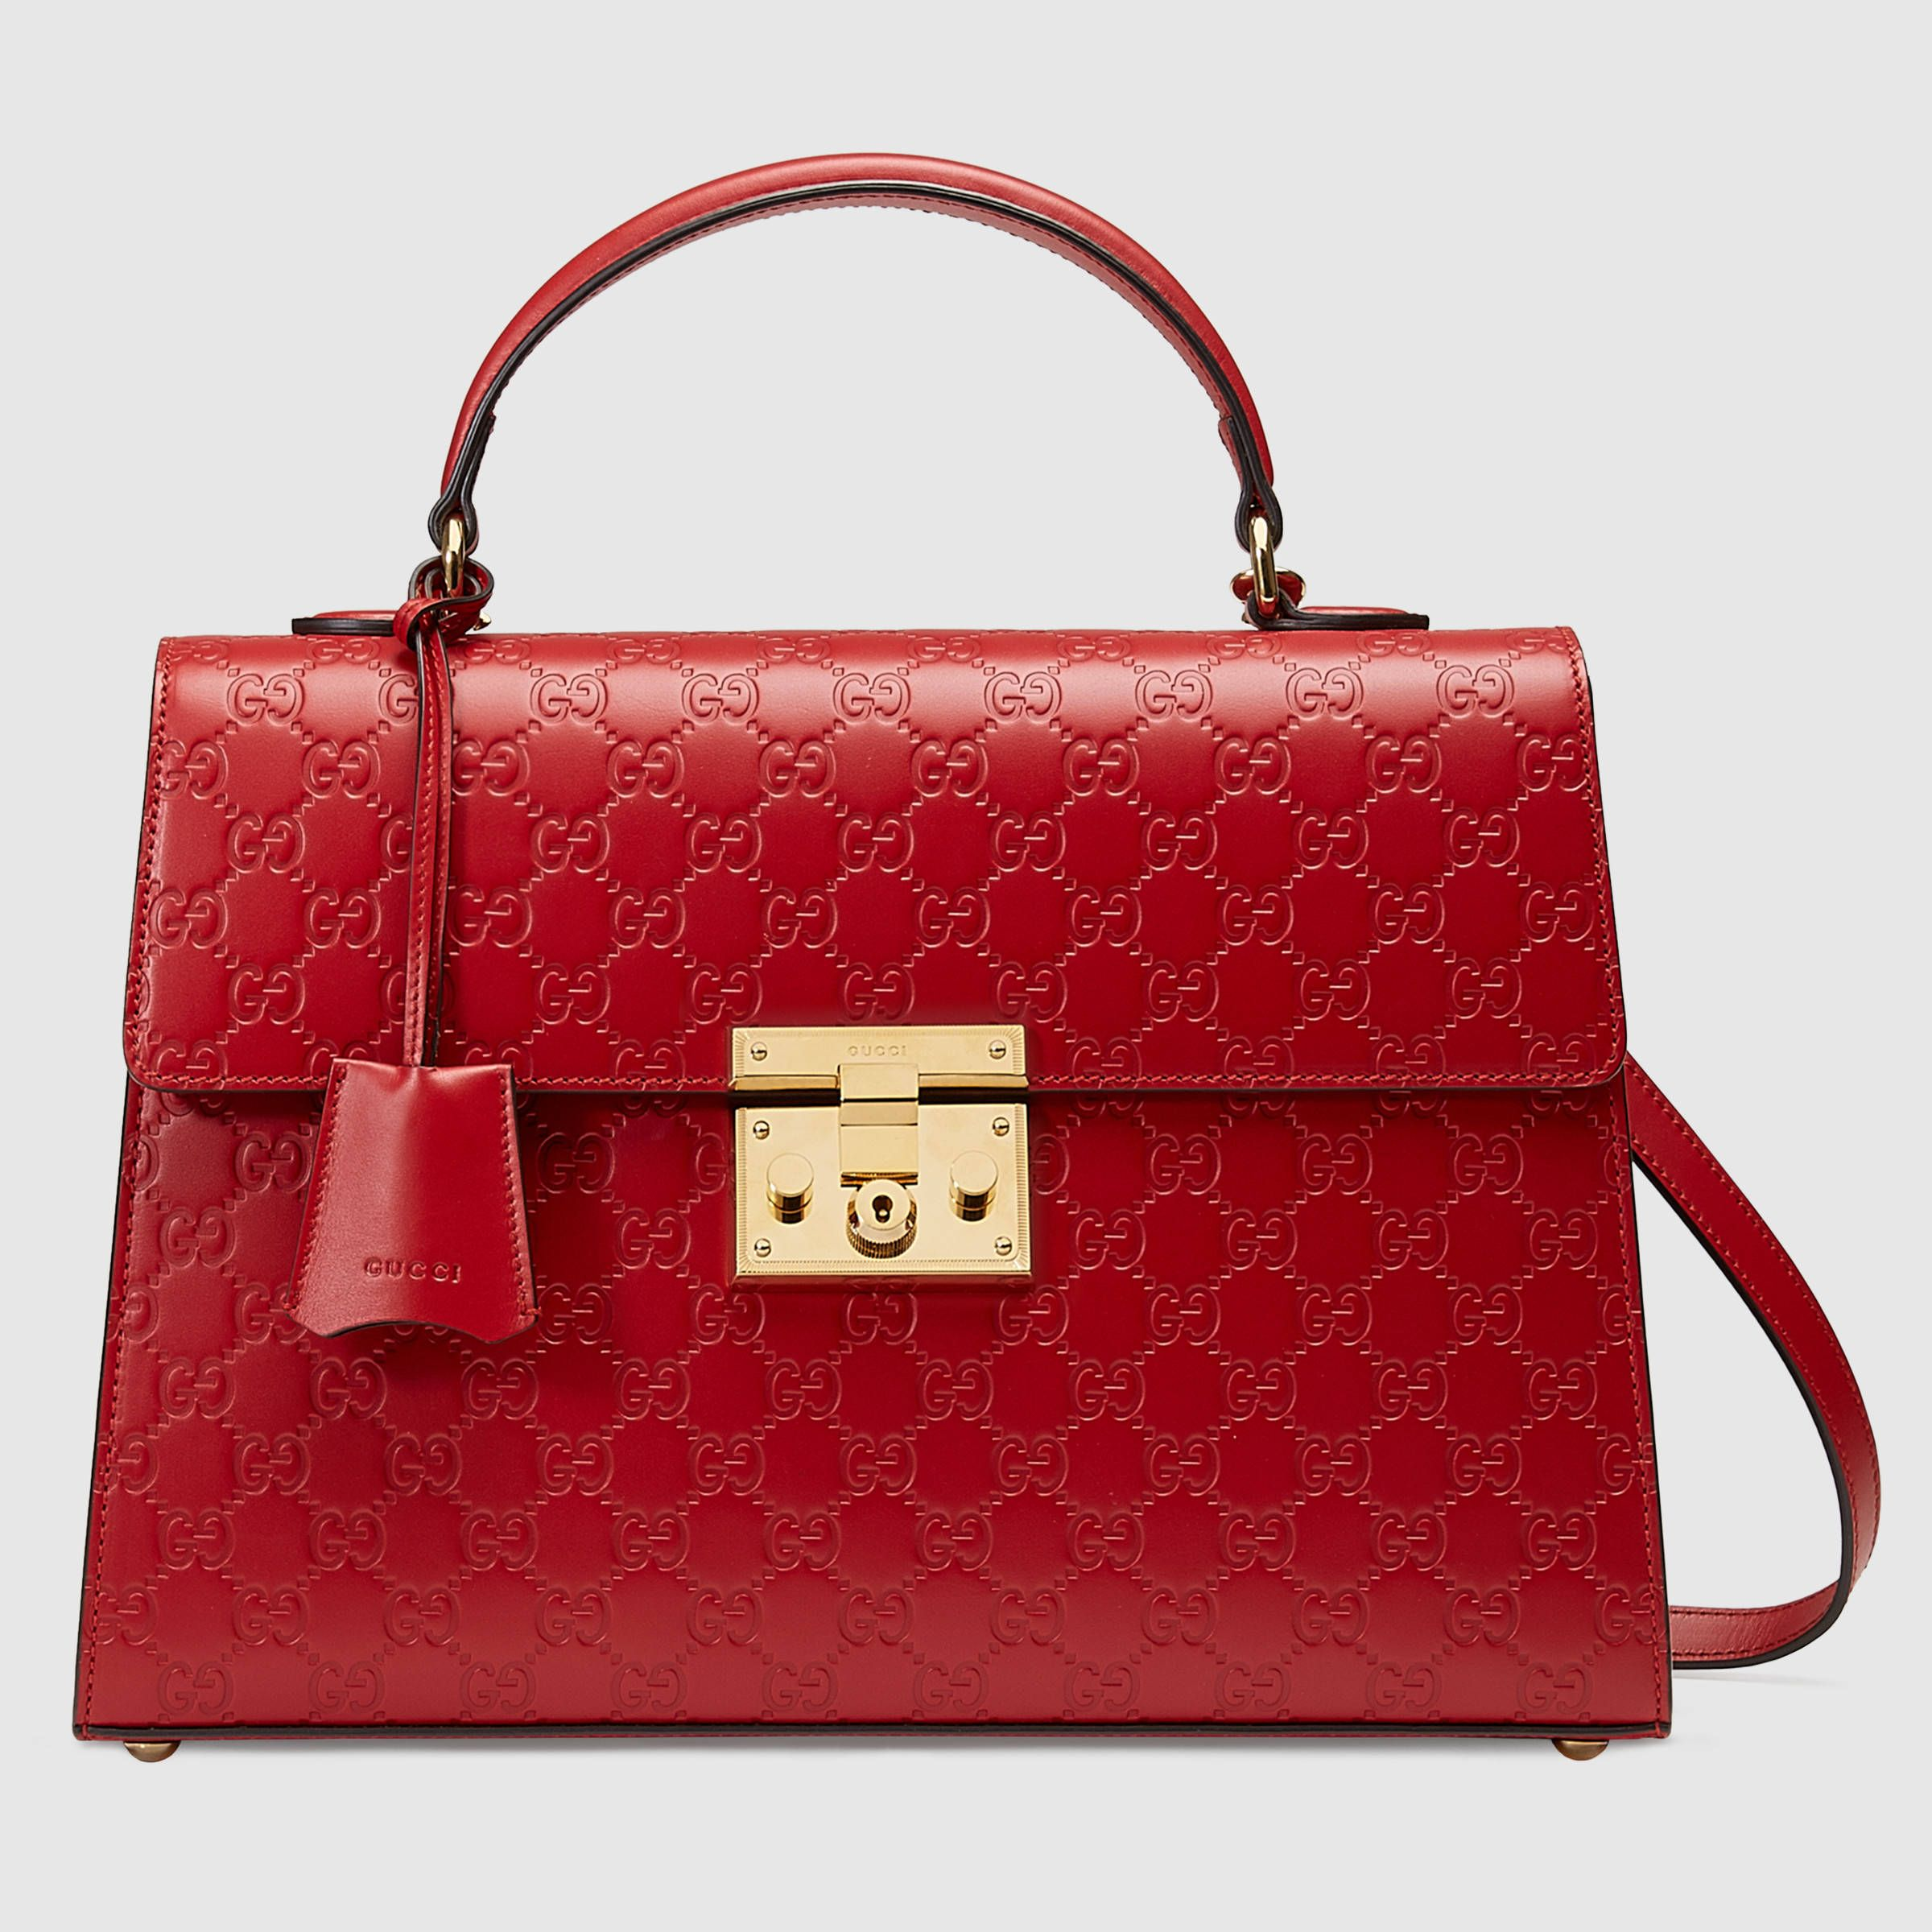 3a037c9757be Padlock Gucci Signature top handle - Gucci Women s Top Handles   Boston Bags  428208CWC1G6433